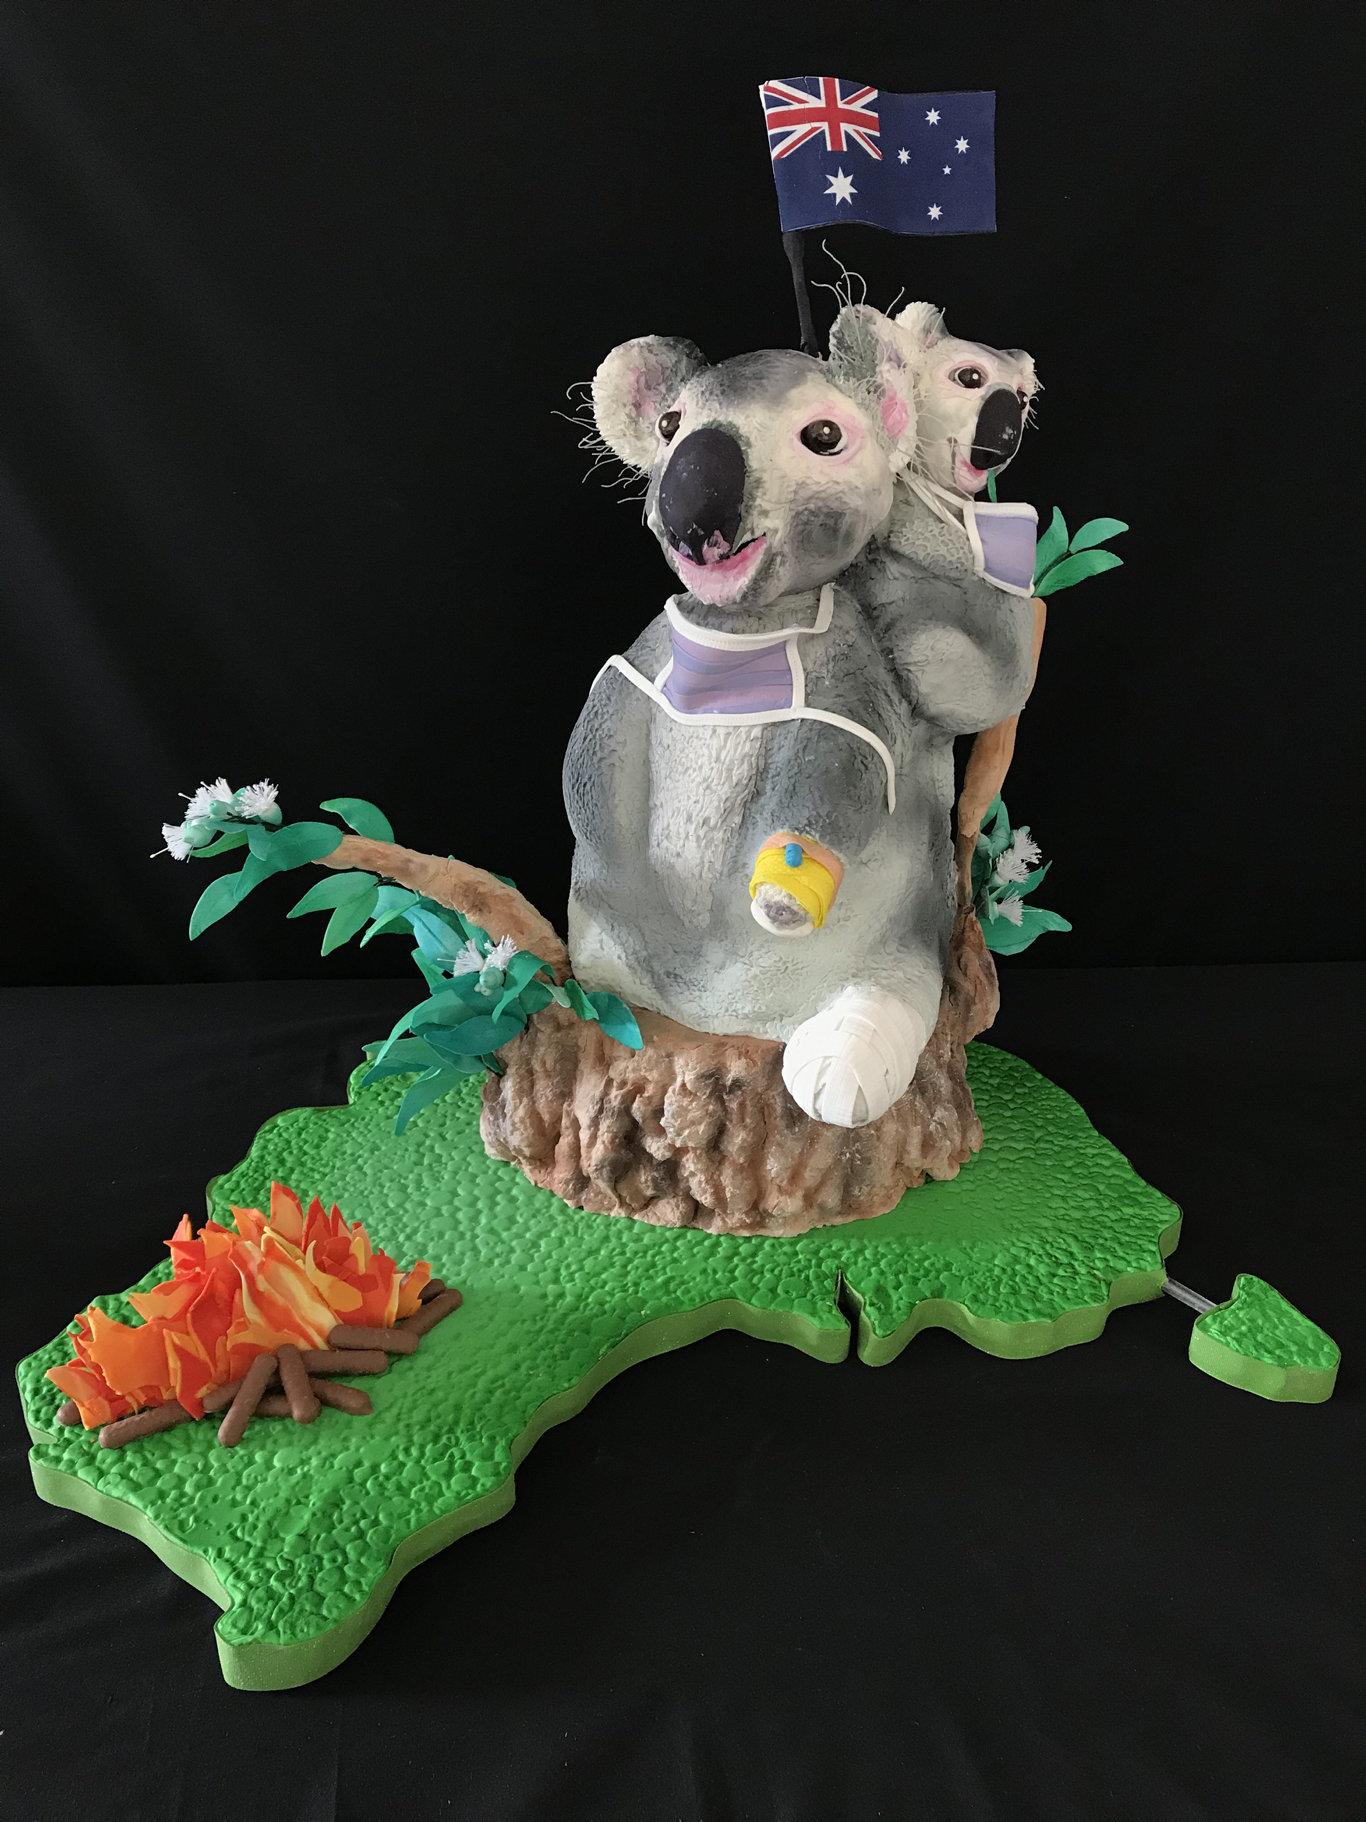 Koala cake made by Sarah Cerqui for breast cancer fundraiser.